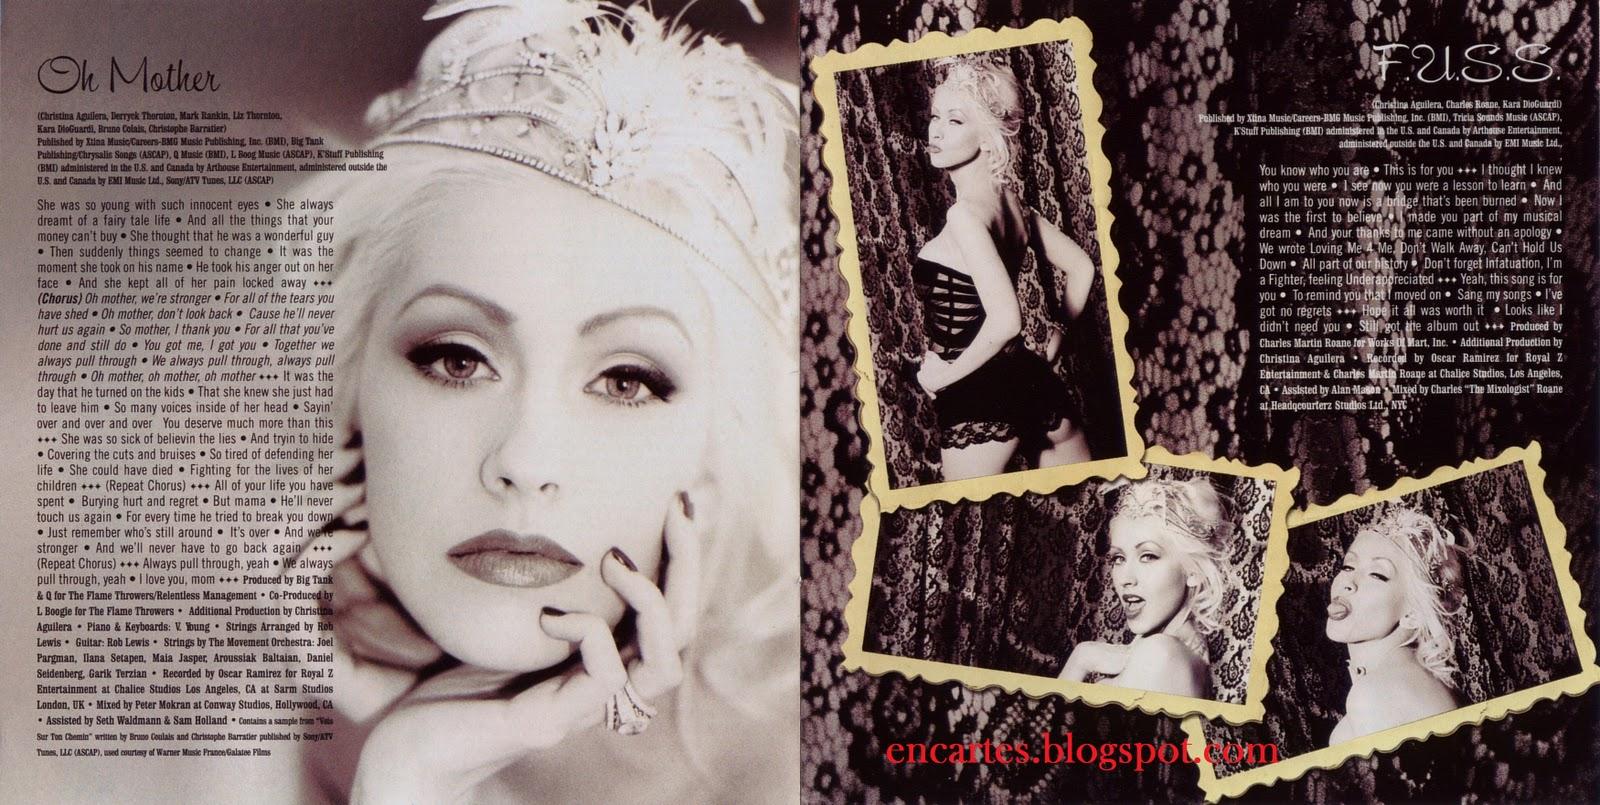 http://4.bp.blogspot.com/-q8HnPPMbCO4/TuDodevCRVI/AAAAAAAAJdc/b-rrEBRDLDA/s1600/Christina+Aguilera+-+Back+To+Basics+-+Booklet+%25286-14%2529.jpg